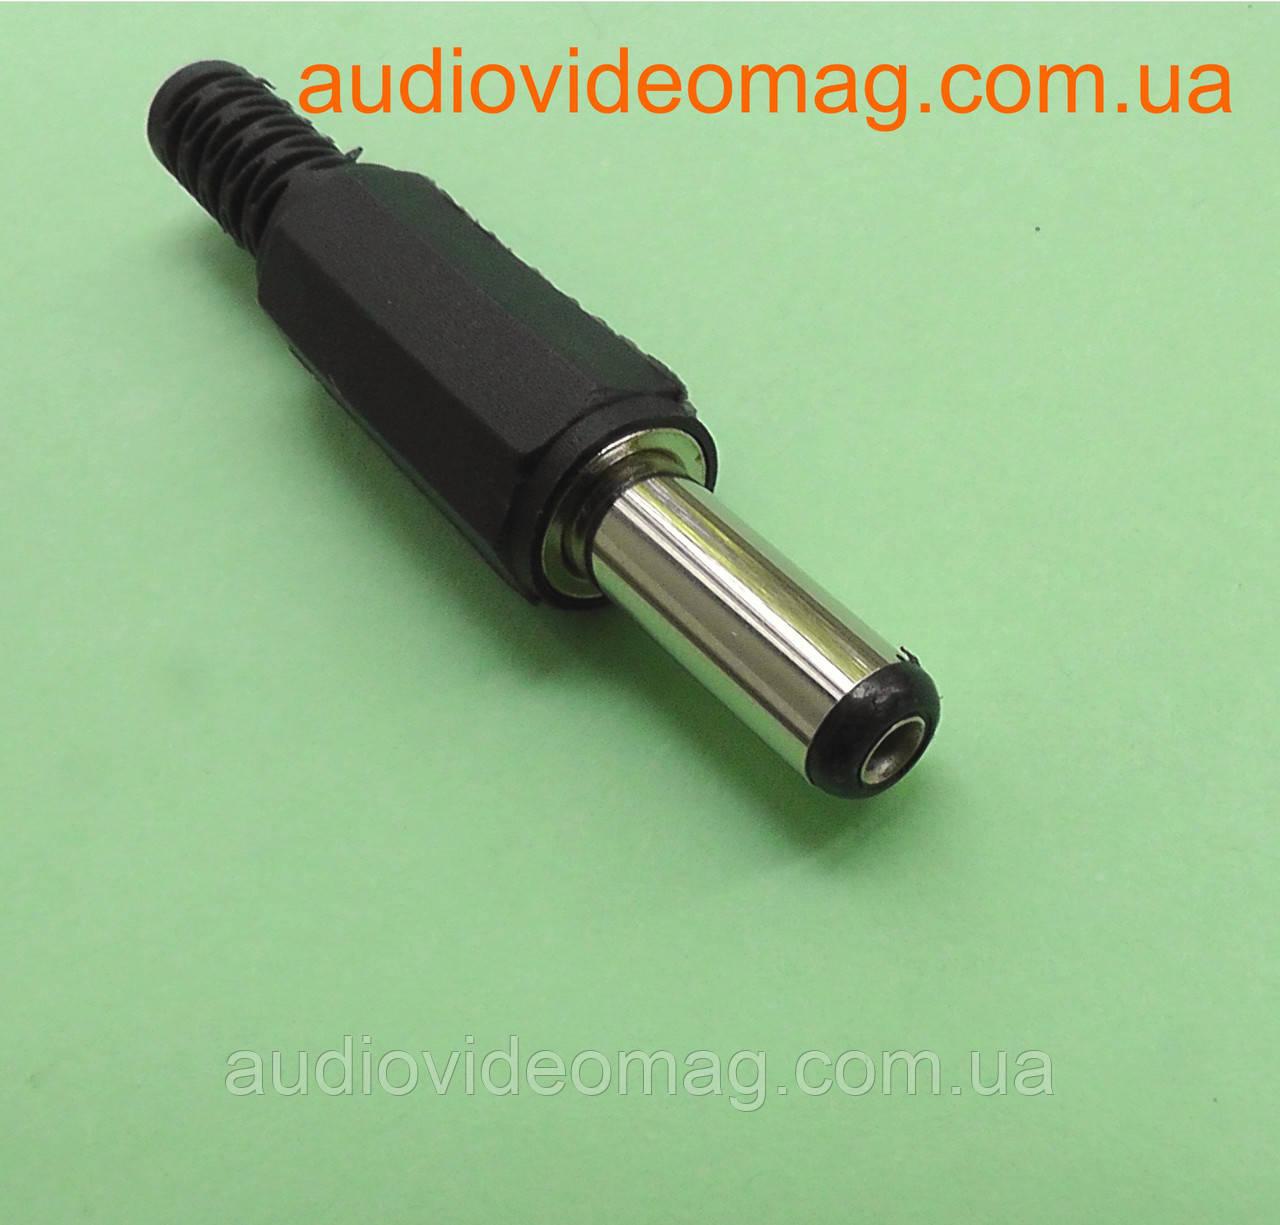 Штекер питания 5.5-2.1 мм, длина 14 мм